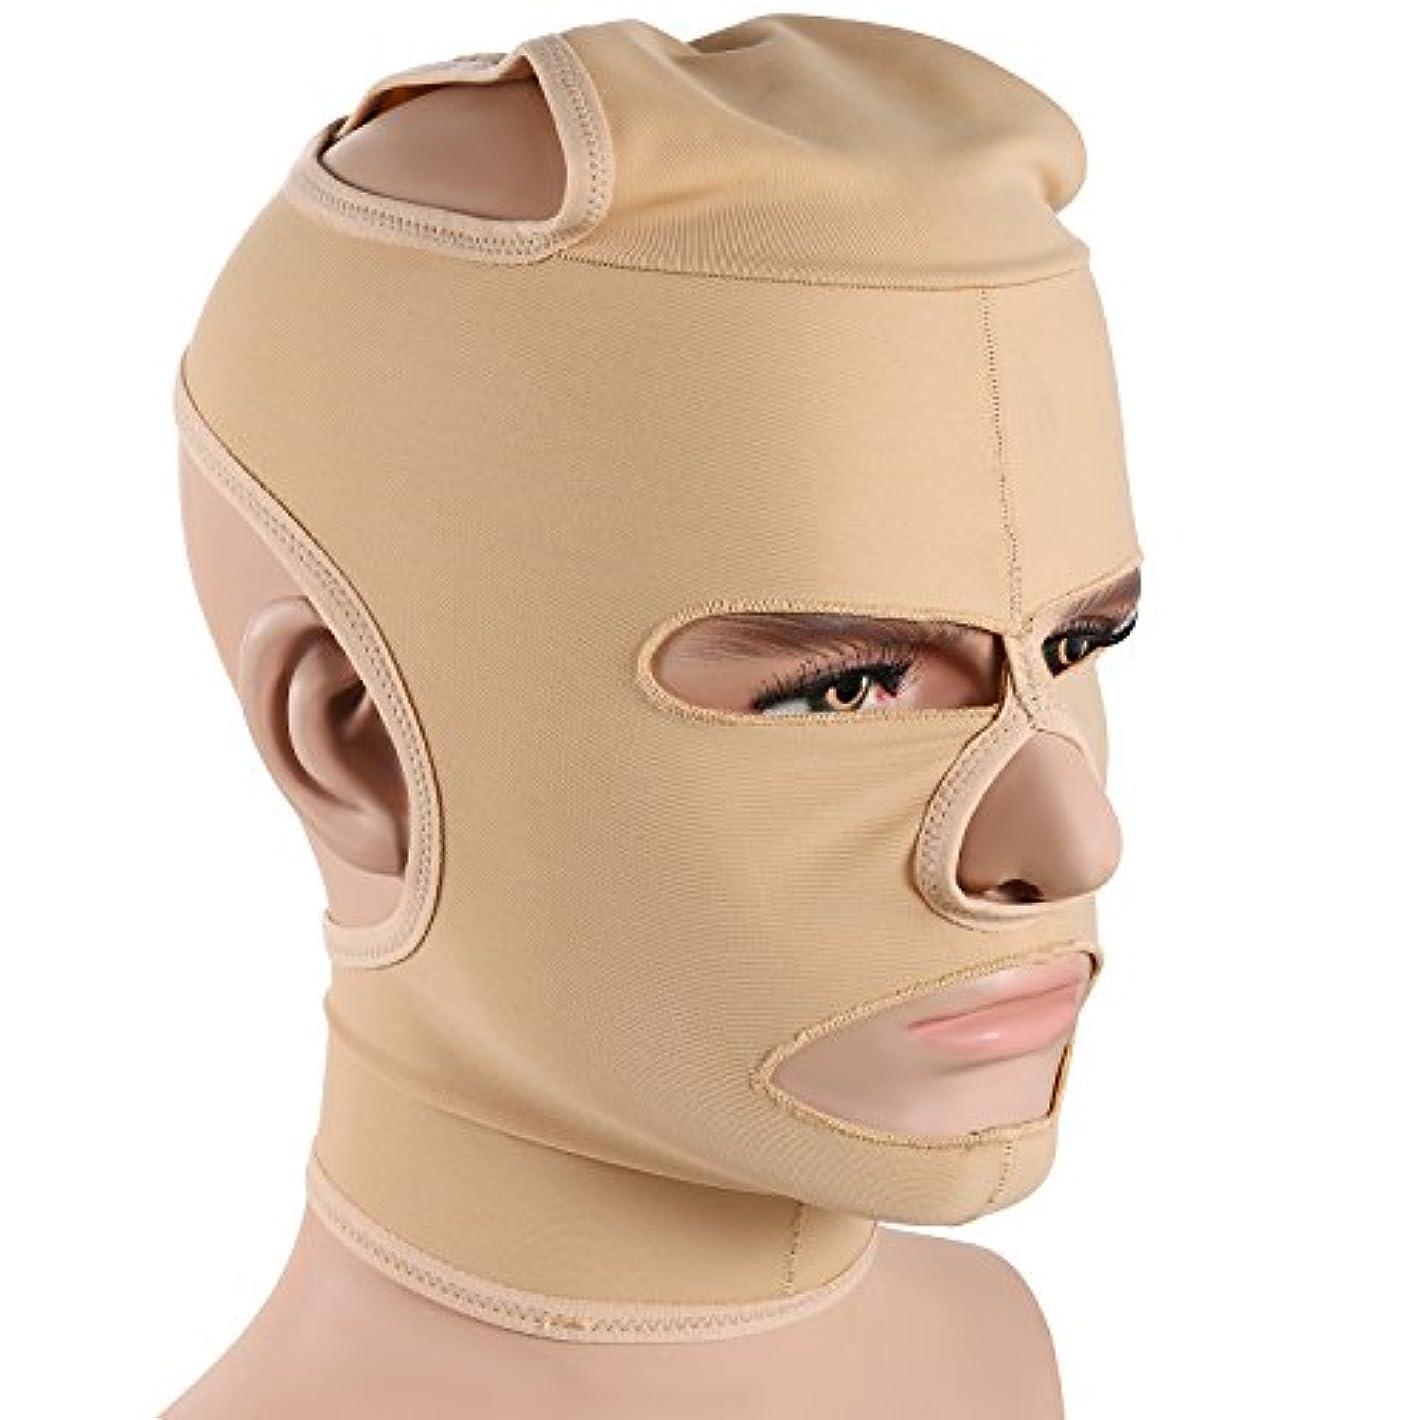 JewelryWe 小顔補正マスク 小顔ベルト 法令線予防 シワ防止 美顔 額、顎下、頬リフトアップ 男女兼用 Mサイズ